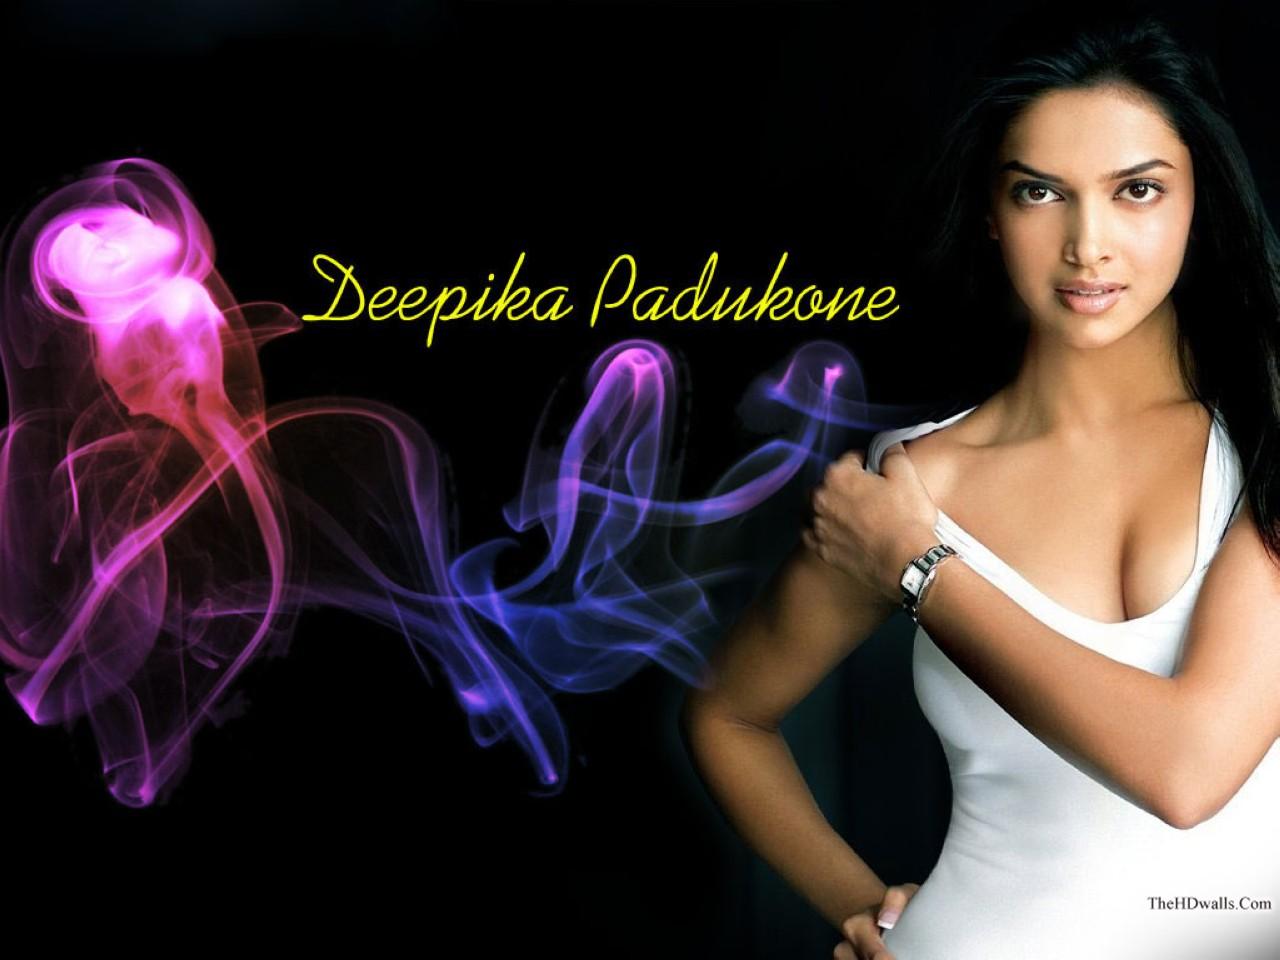 Bollywood Deepika Padukone wallpapers Deepika_padukone_hq_bollywood_celebrity_wallpape